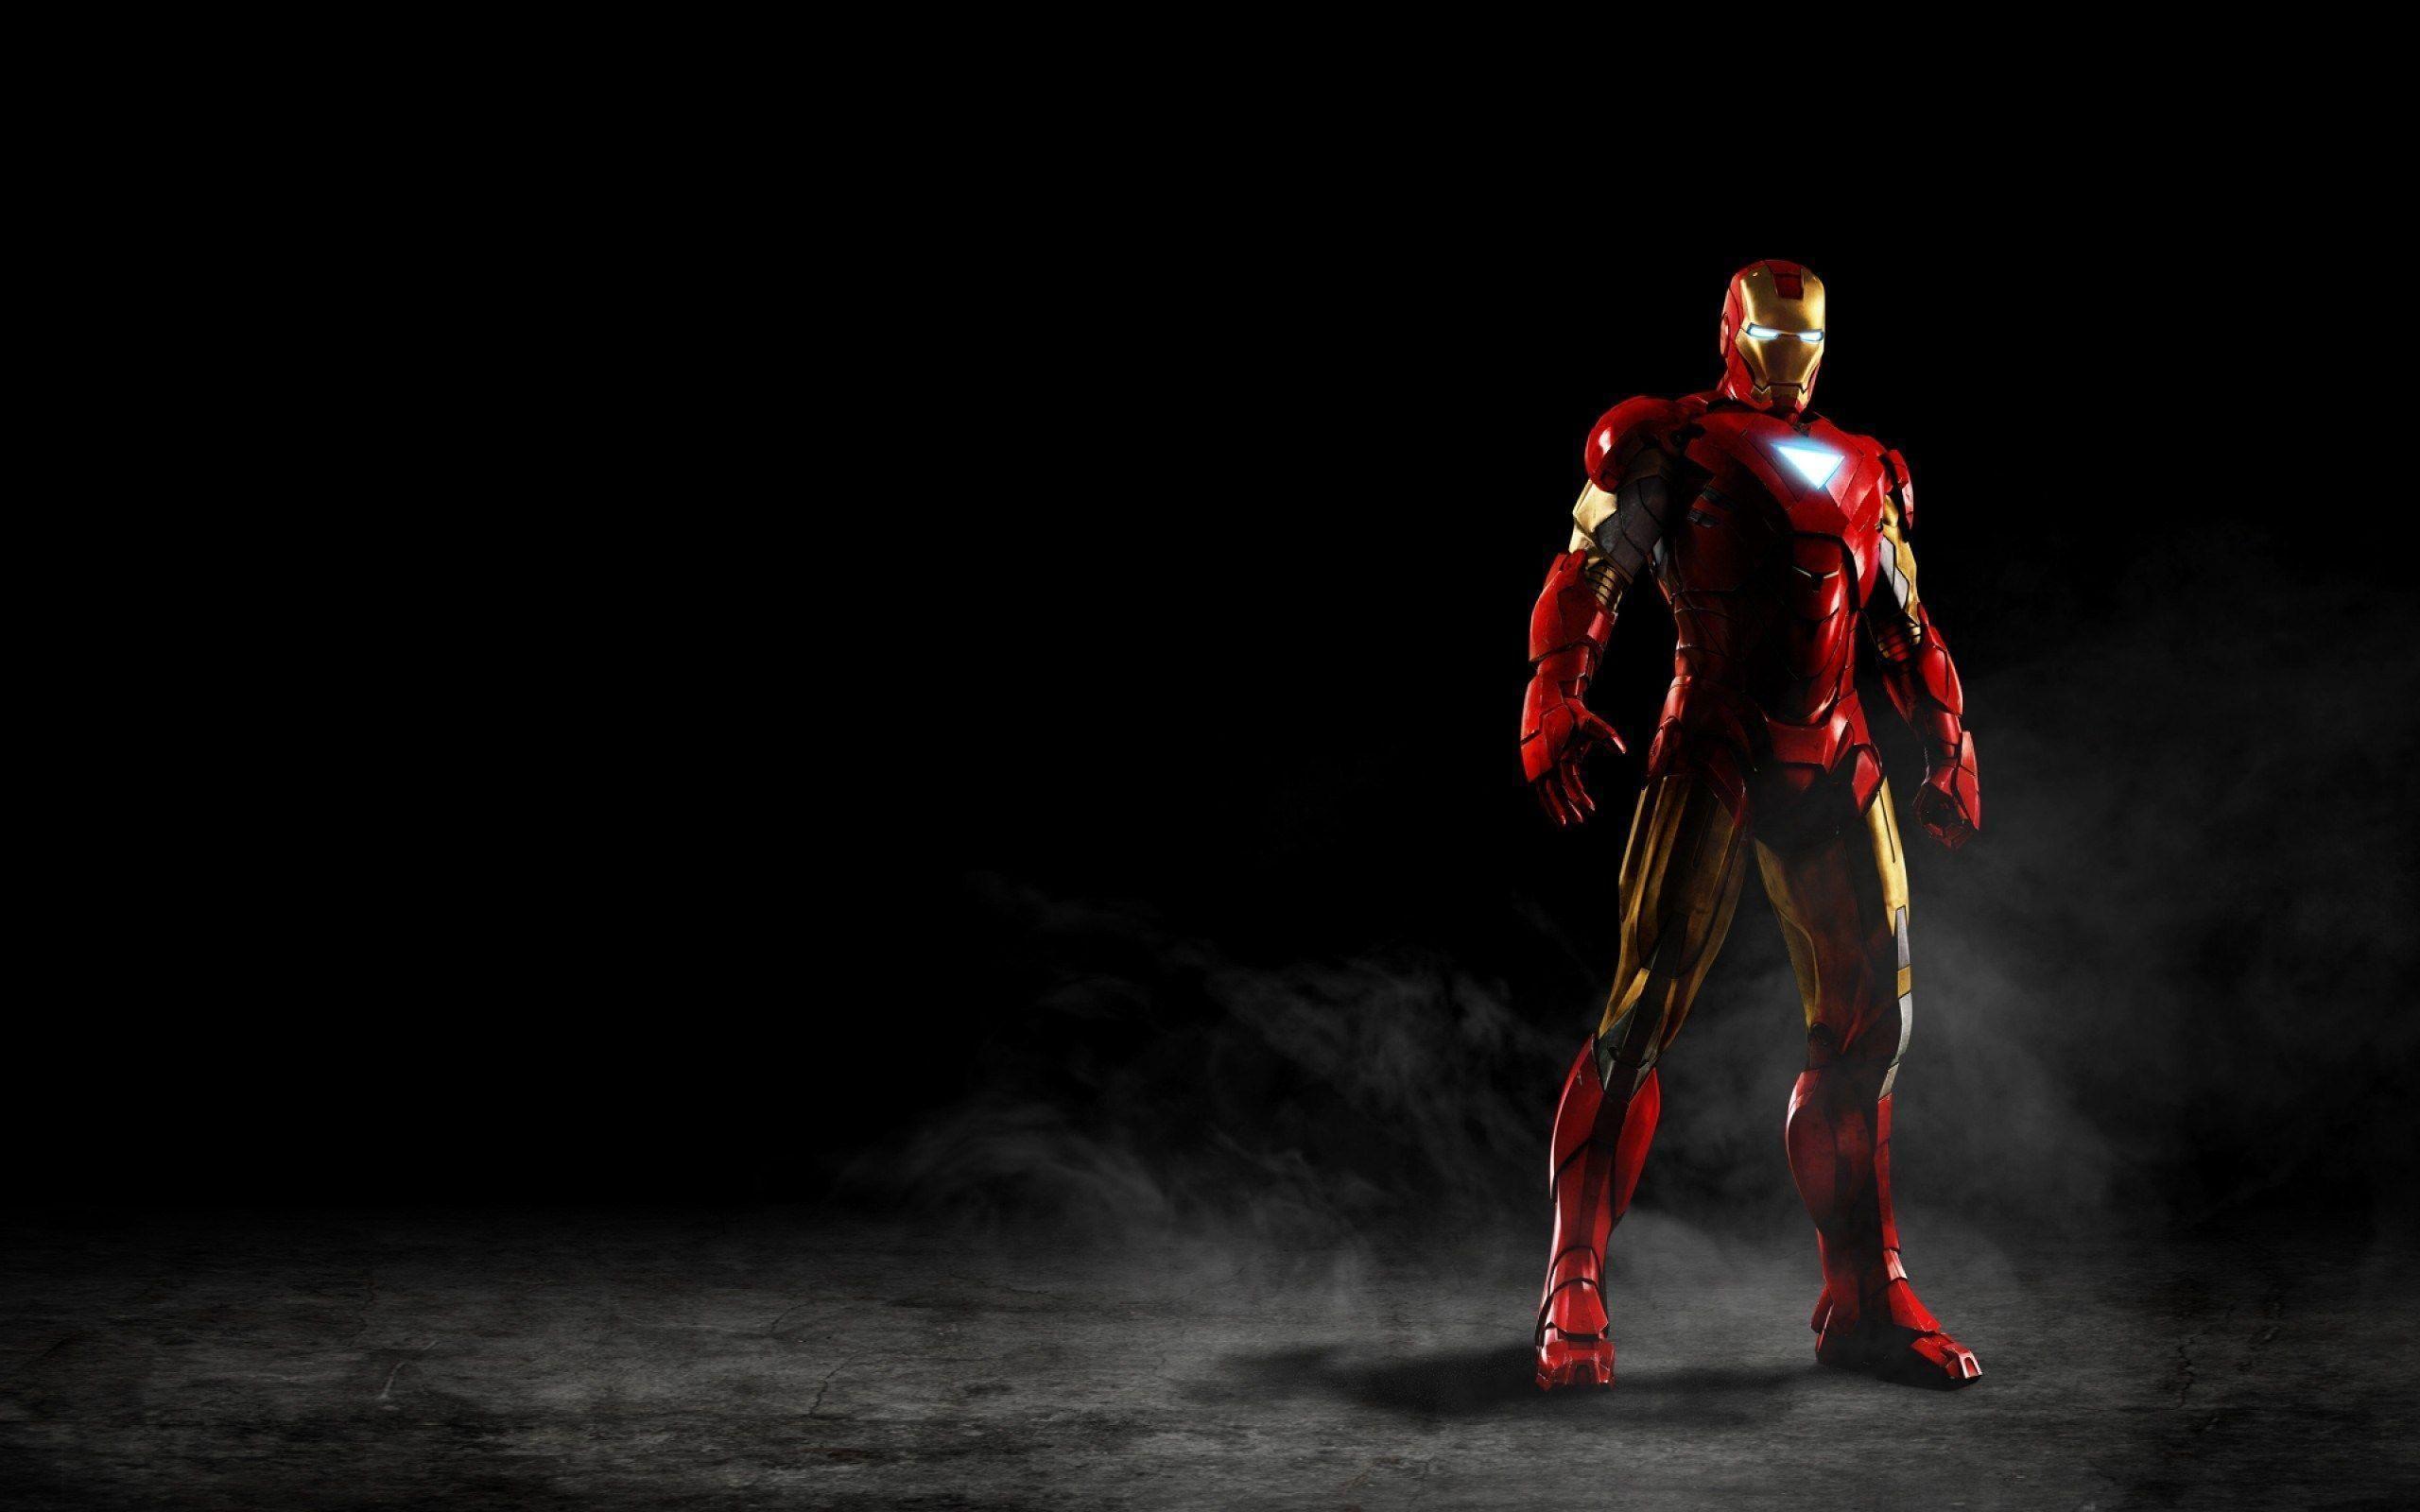 Iron Man Wallpapers Full Hd Wallpaper Search Iron Man Hd Wallpaper Iron Man Wallpaper Man Wallpaper